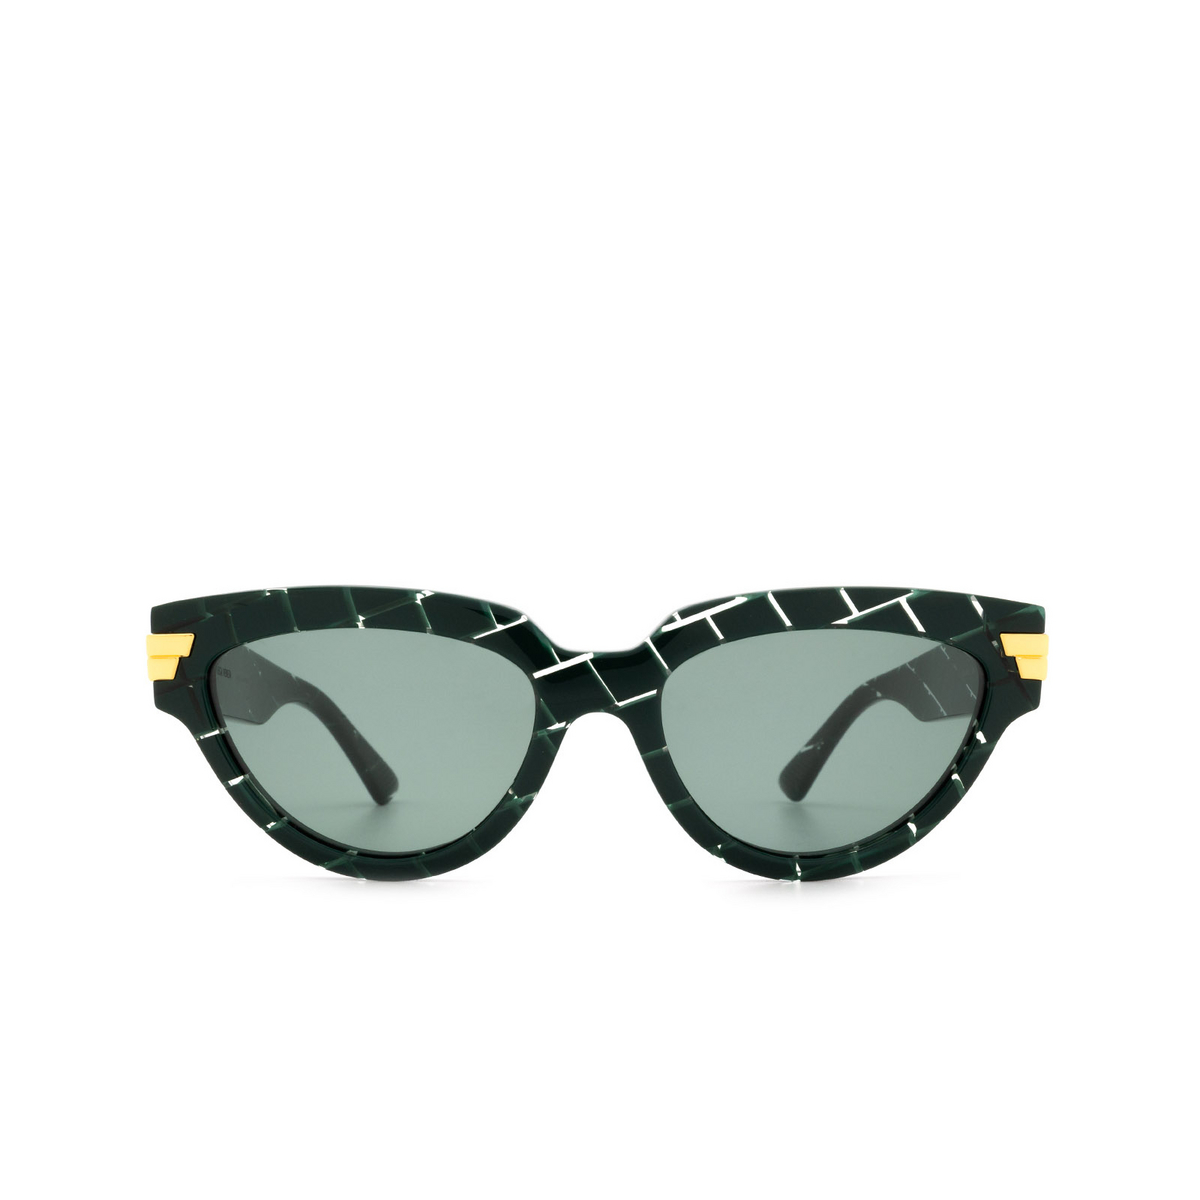 Bottega Veneta® Cat-eye Sunglasses: BV1035S color Green 004 - 1/3.